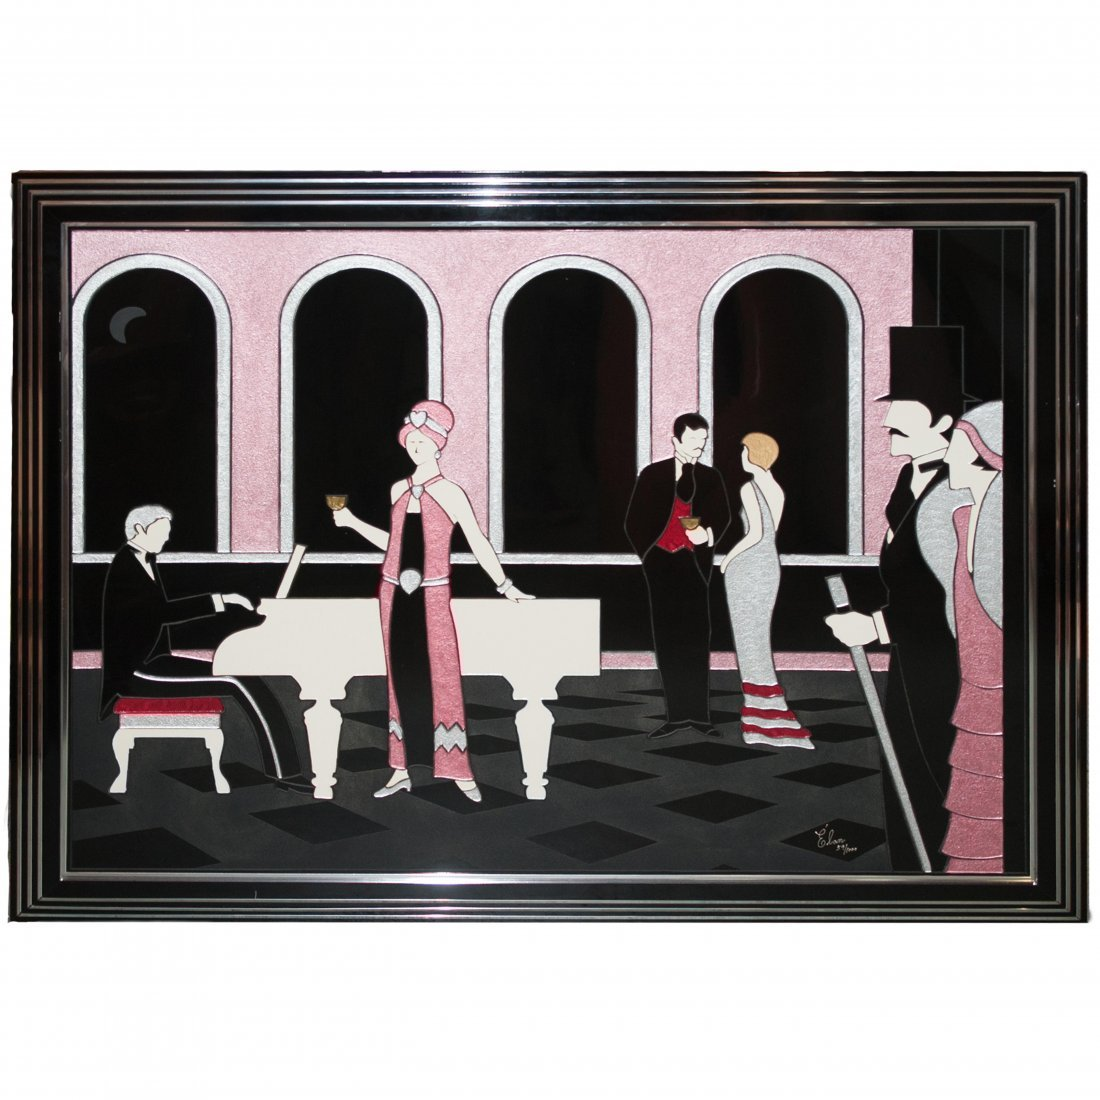 Elan Acrylic Painting